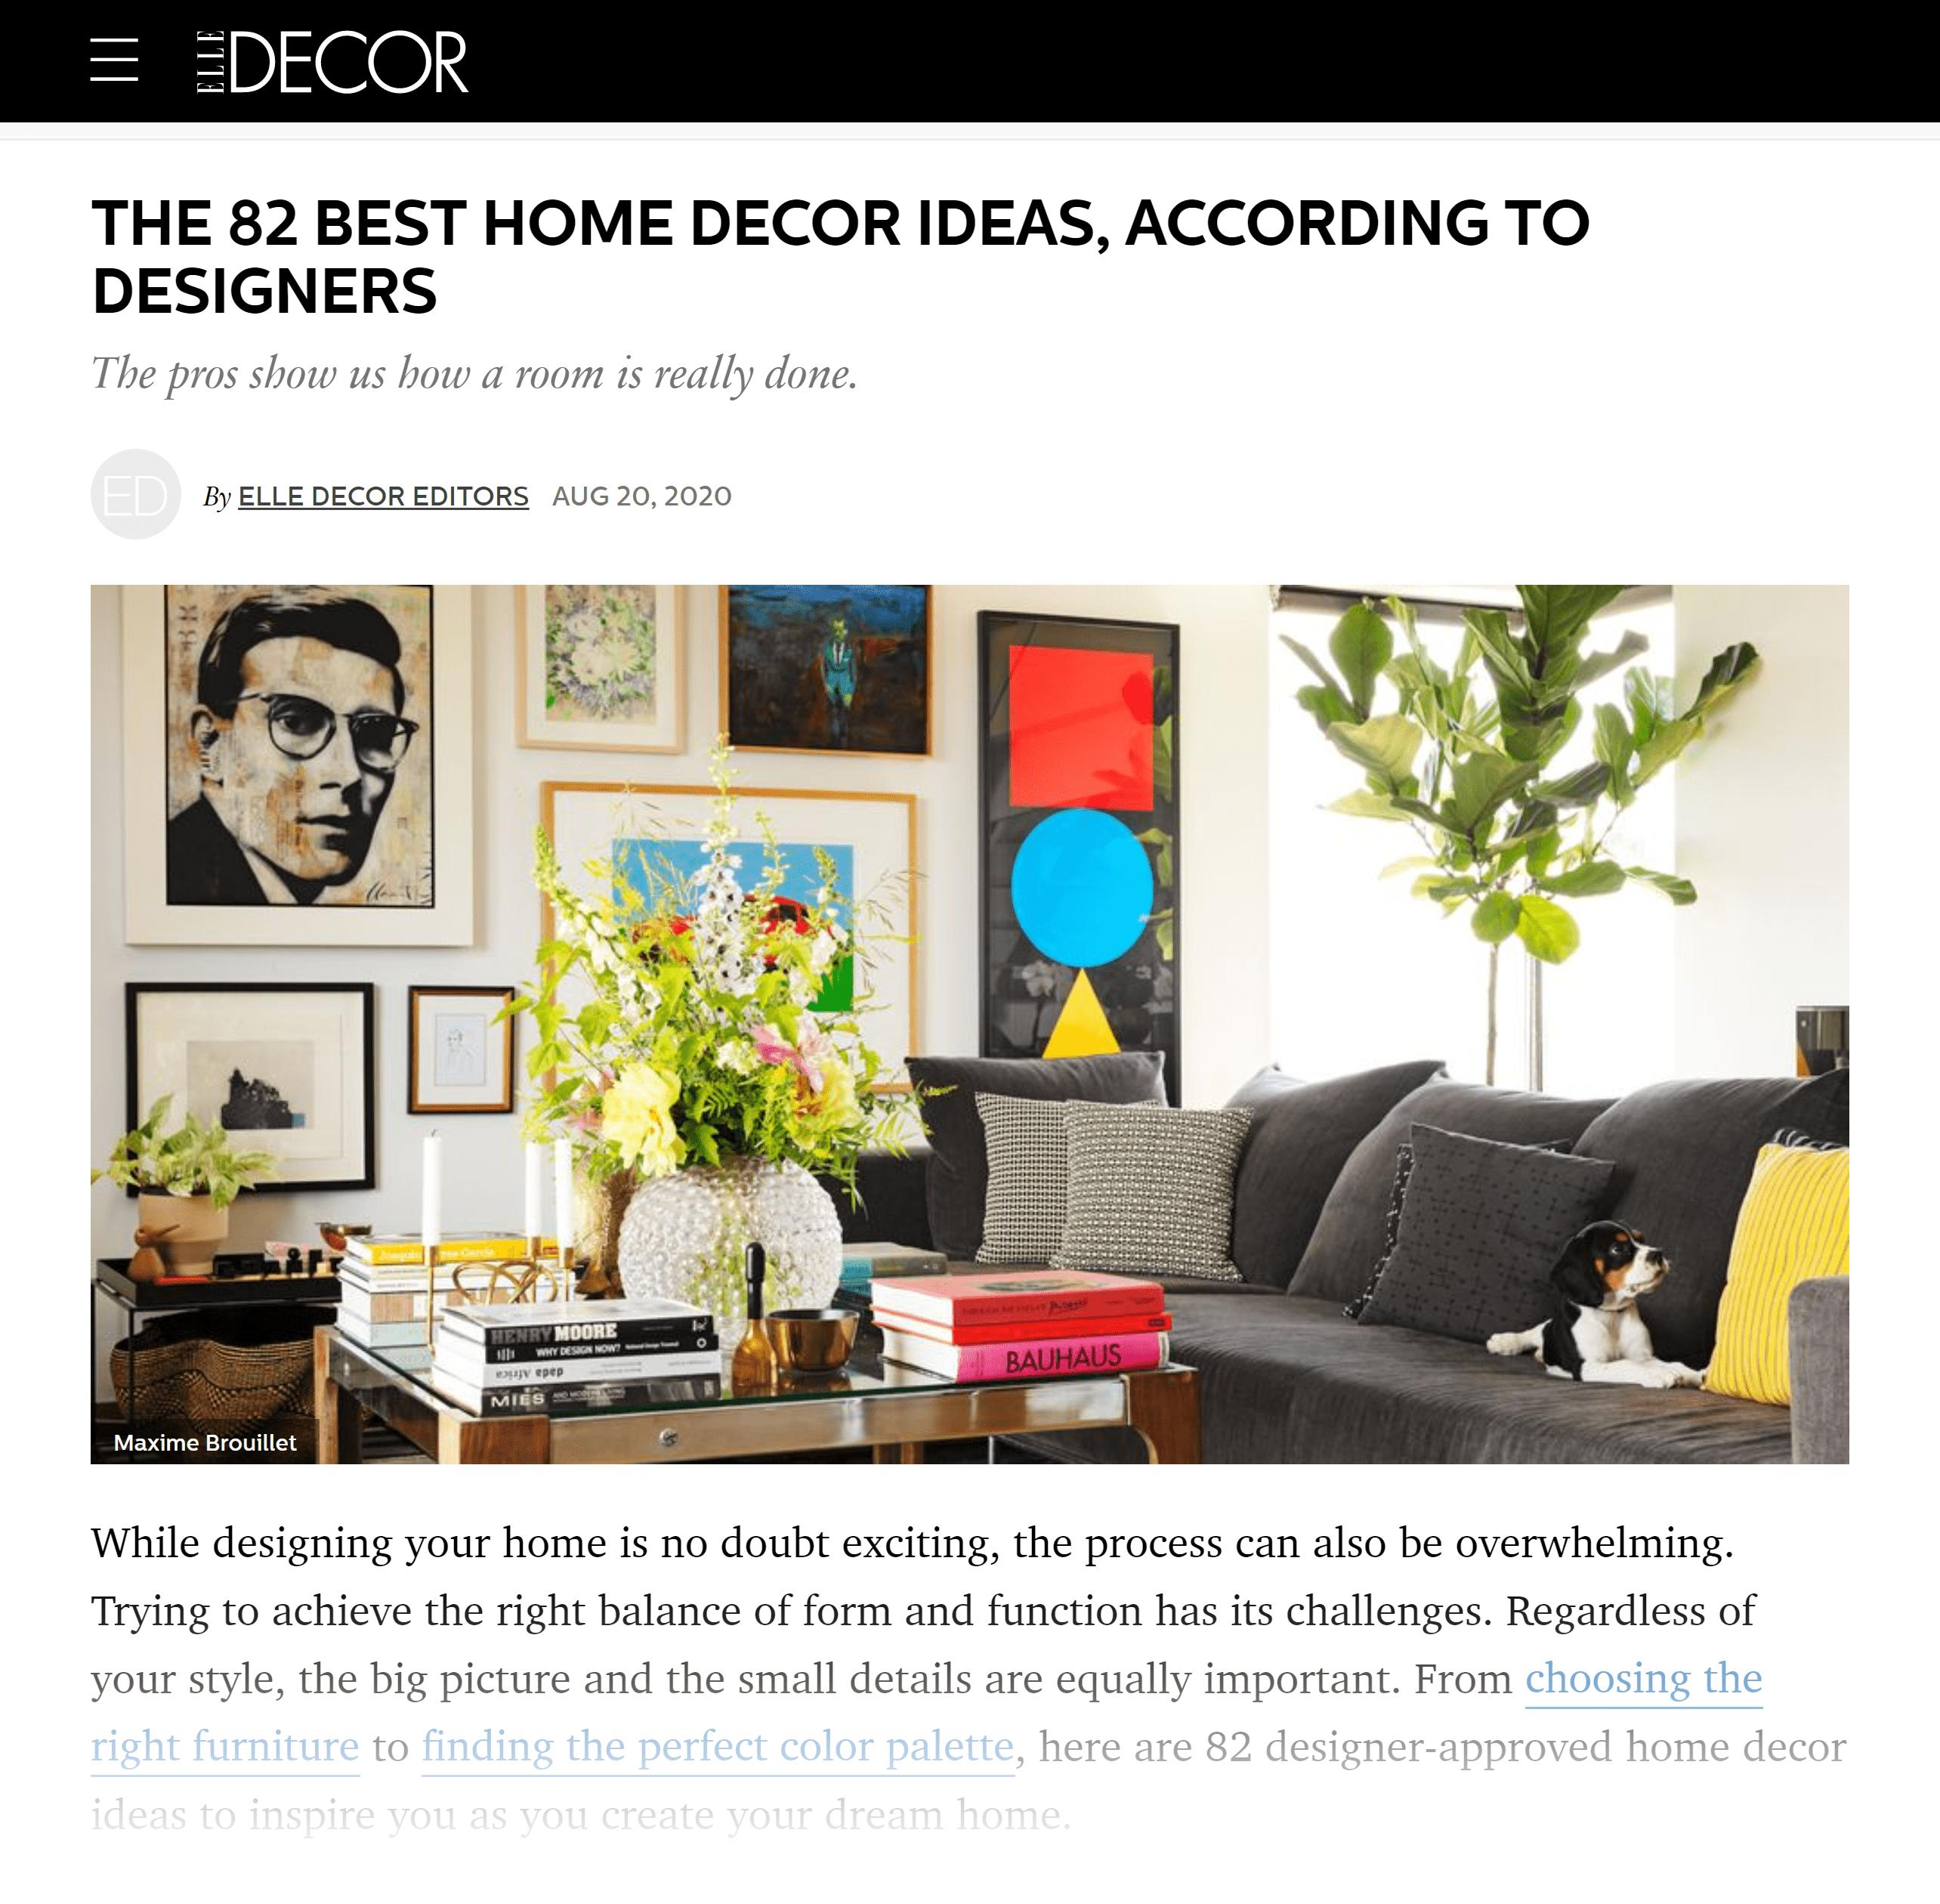 Elle Decor – Home decor ideas